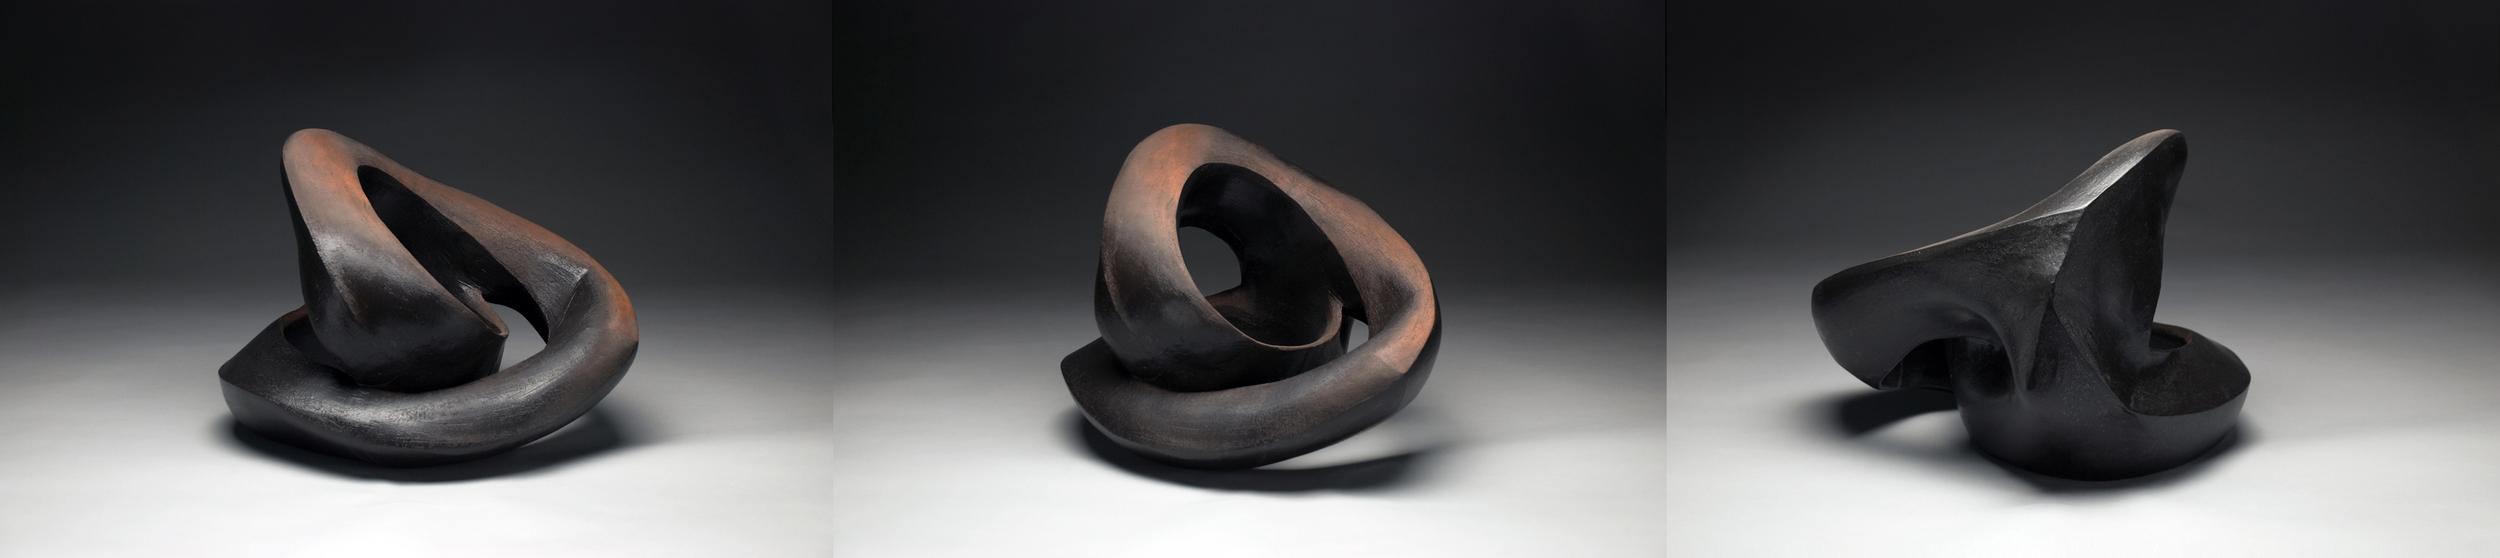 Recoil Series (Black), 2013